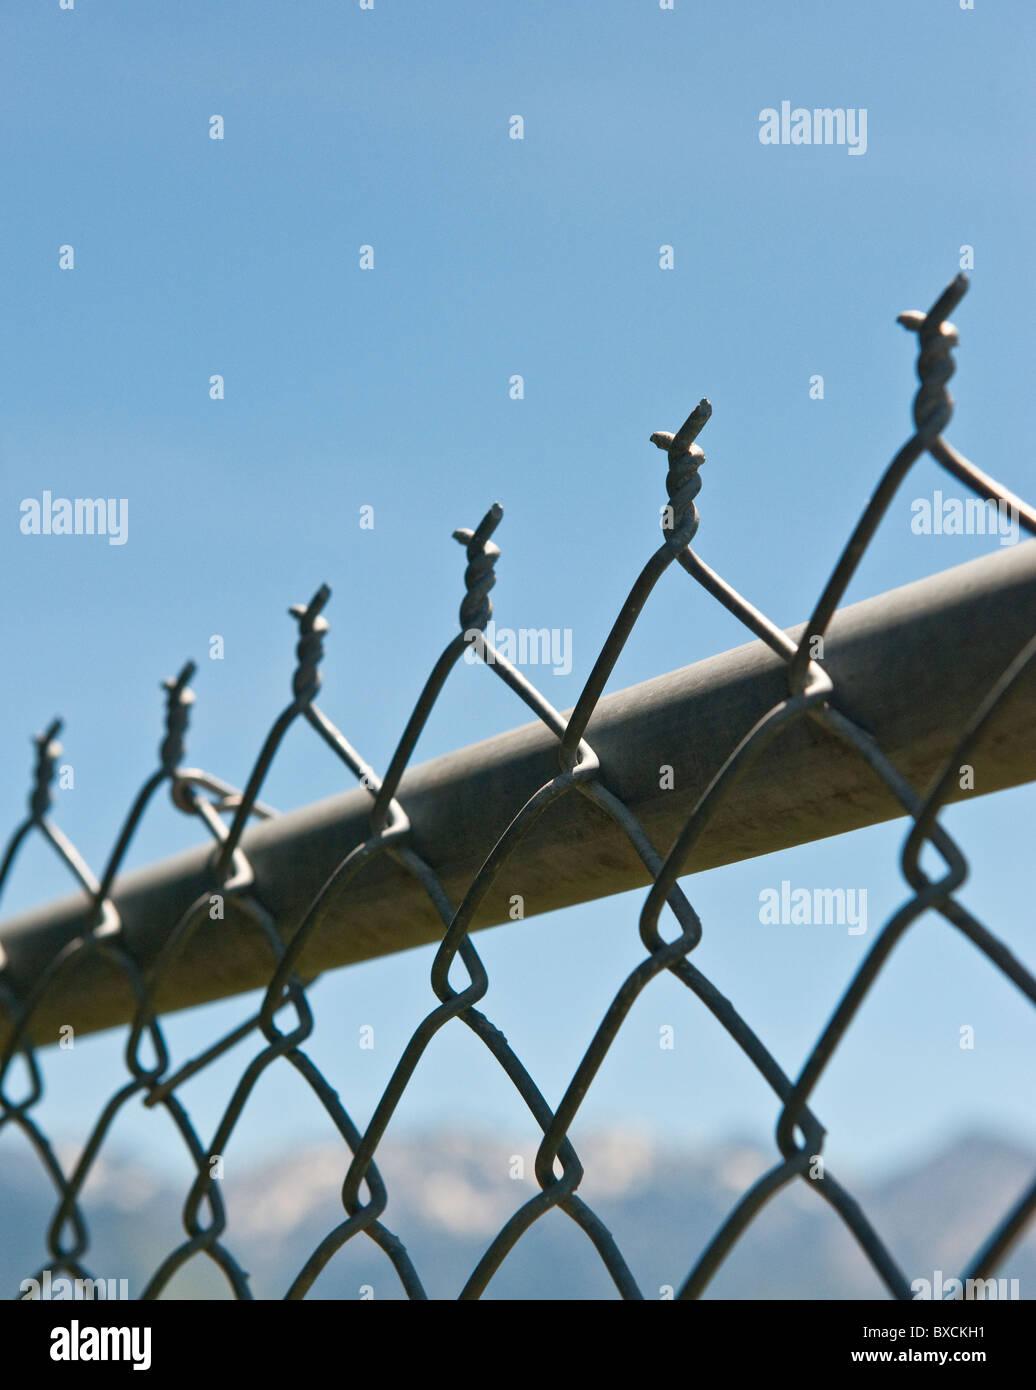 Confine Stockfotos & Confine Bilder - Alamy